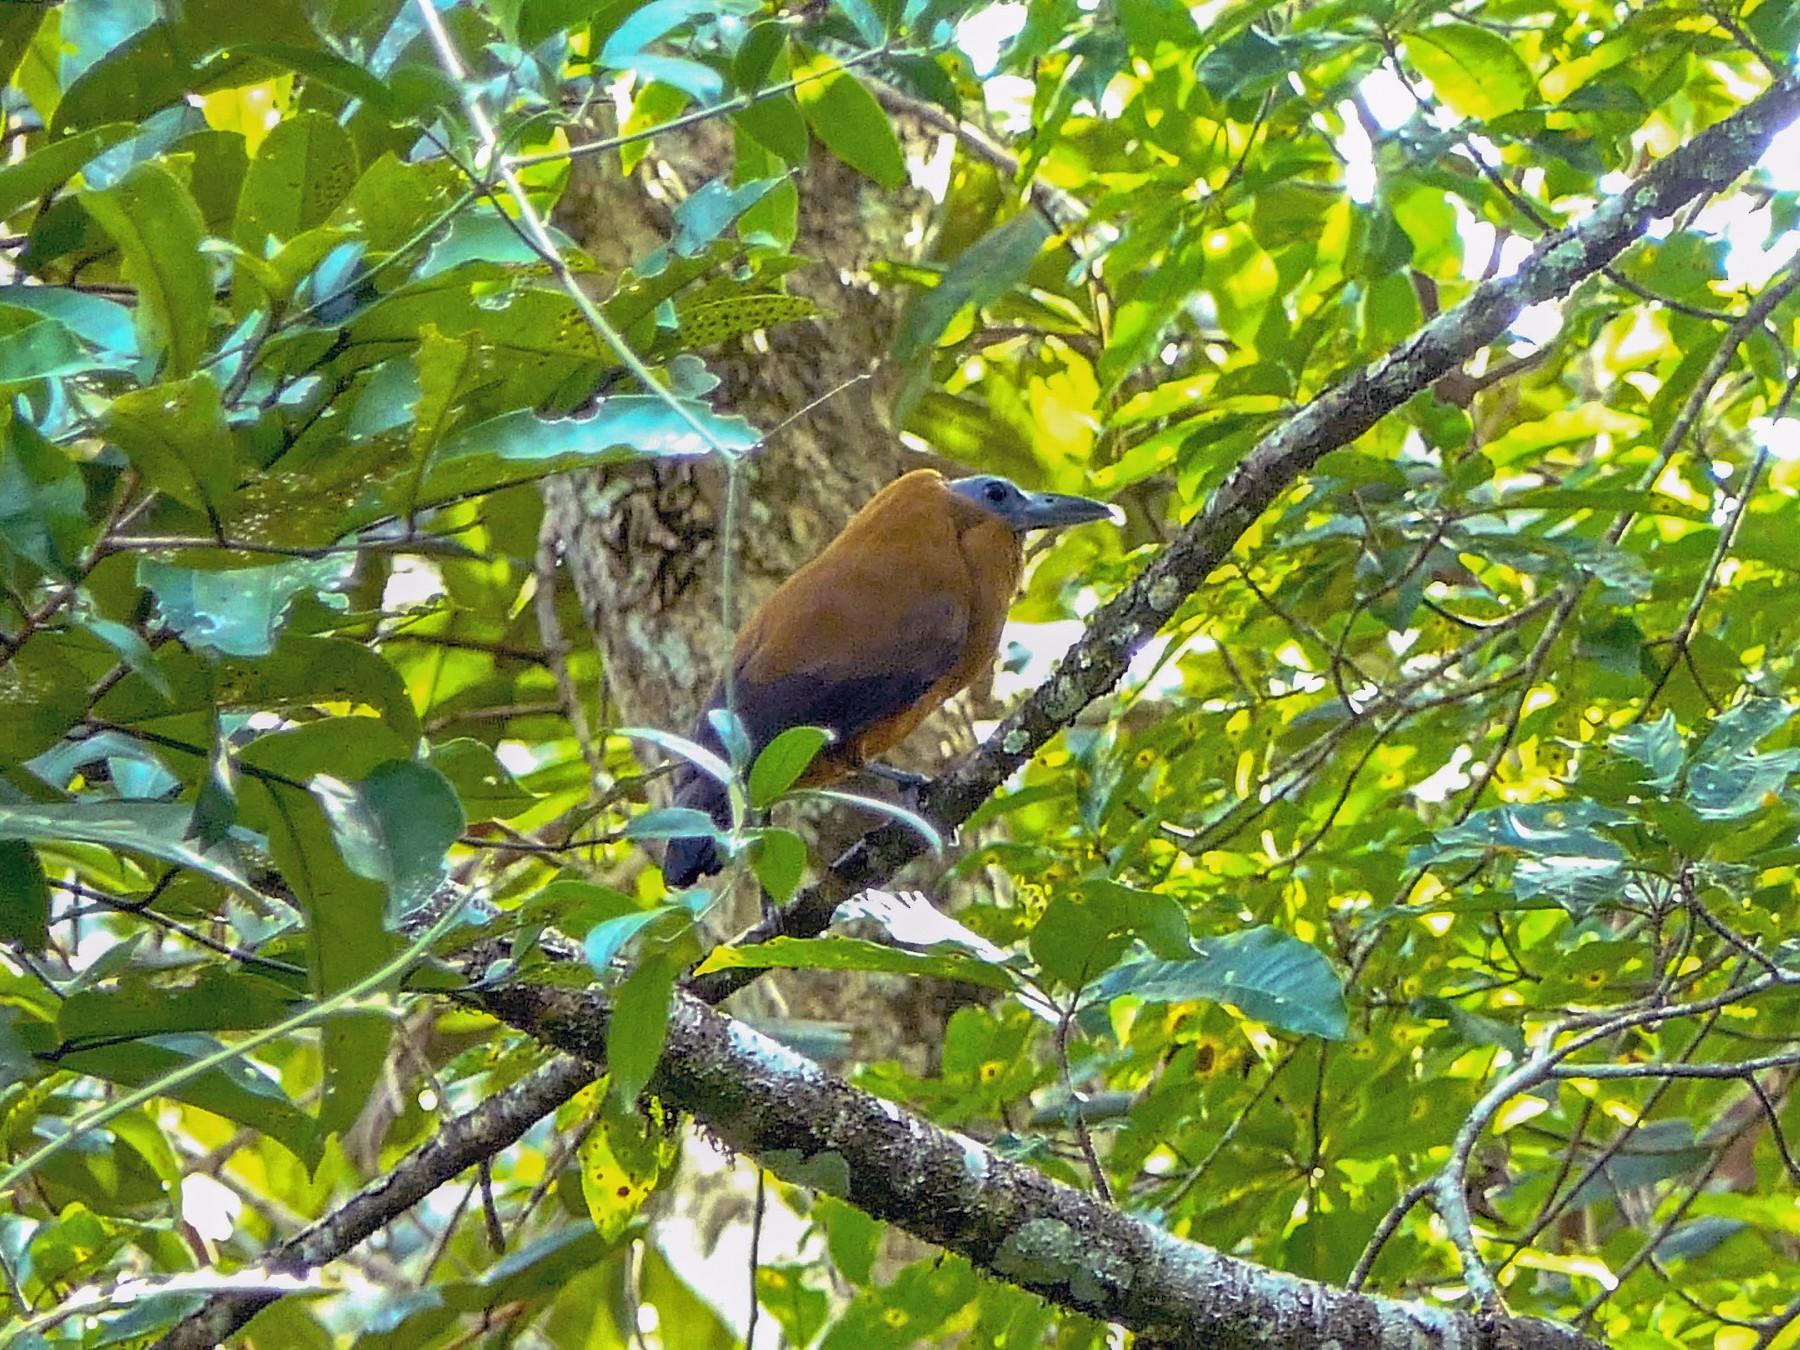 Capuchinbird - Randall Siebert